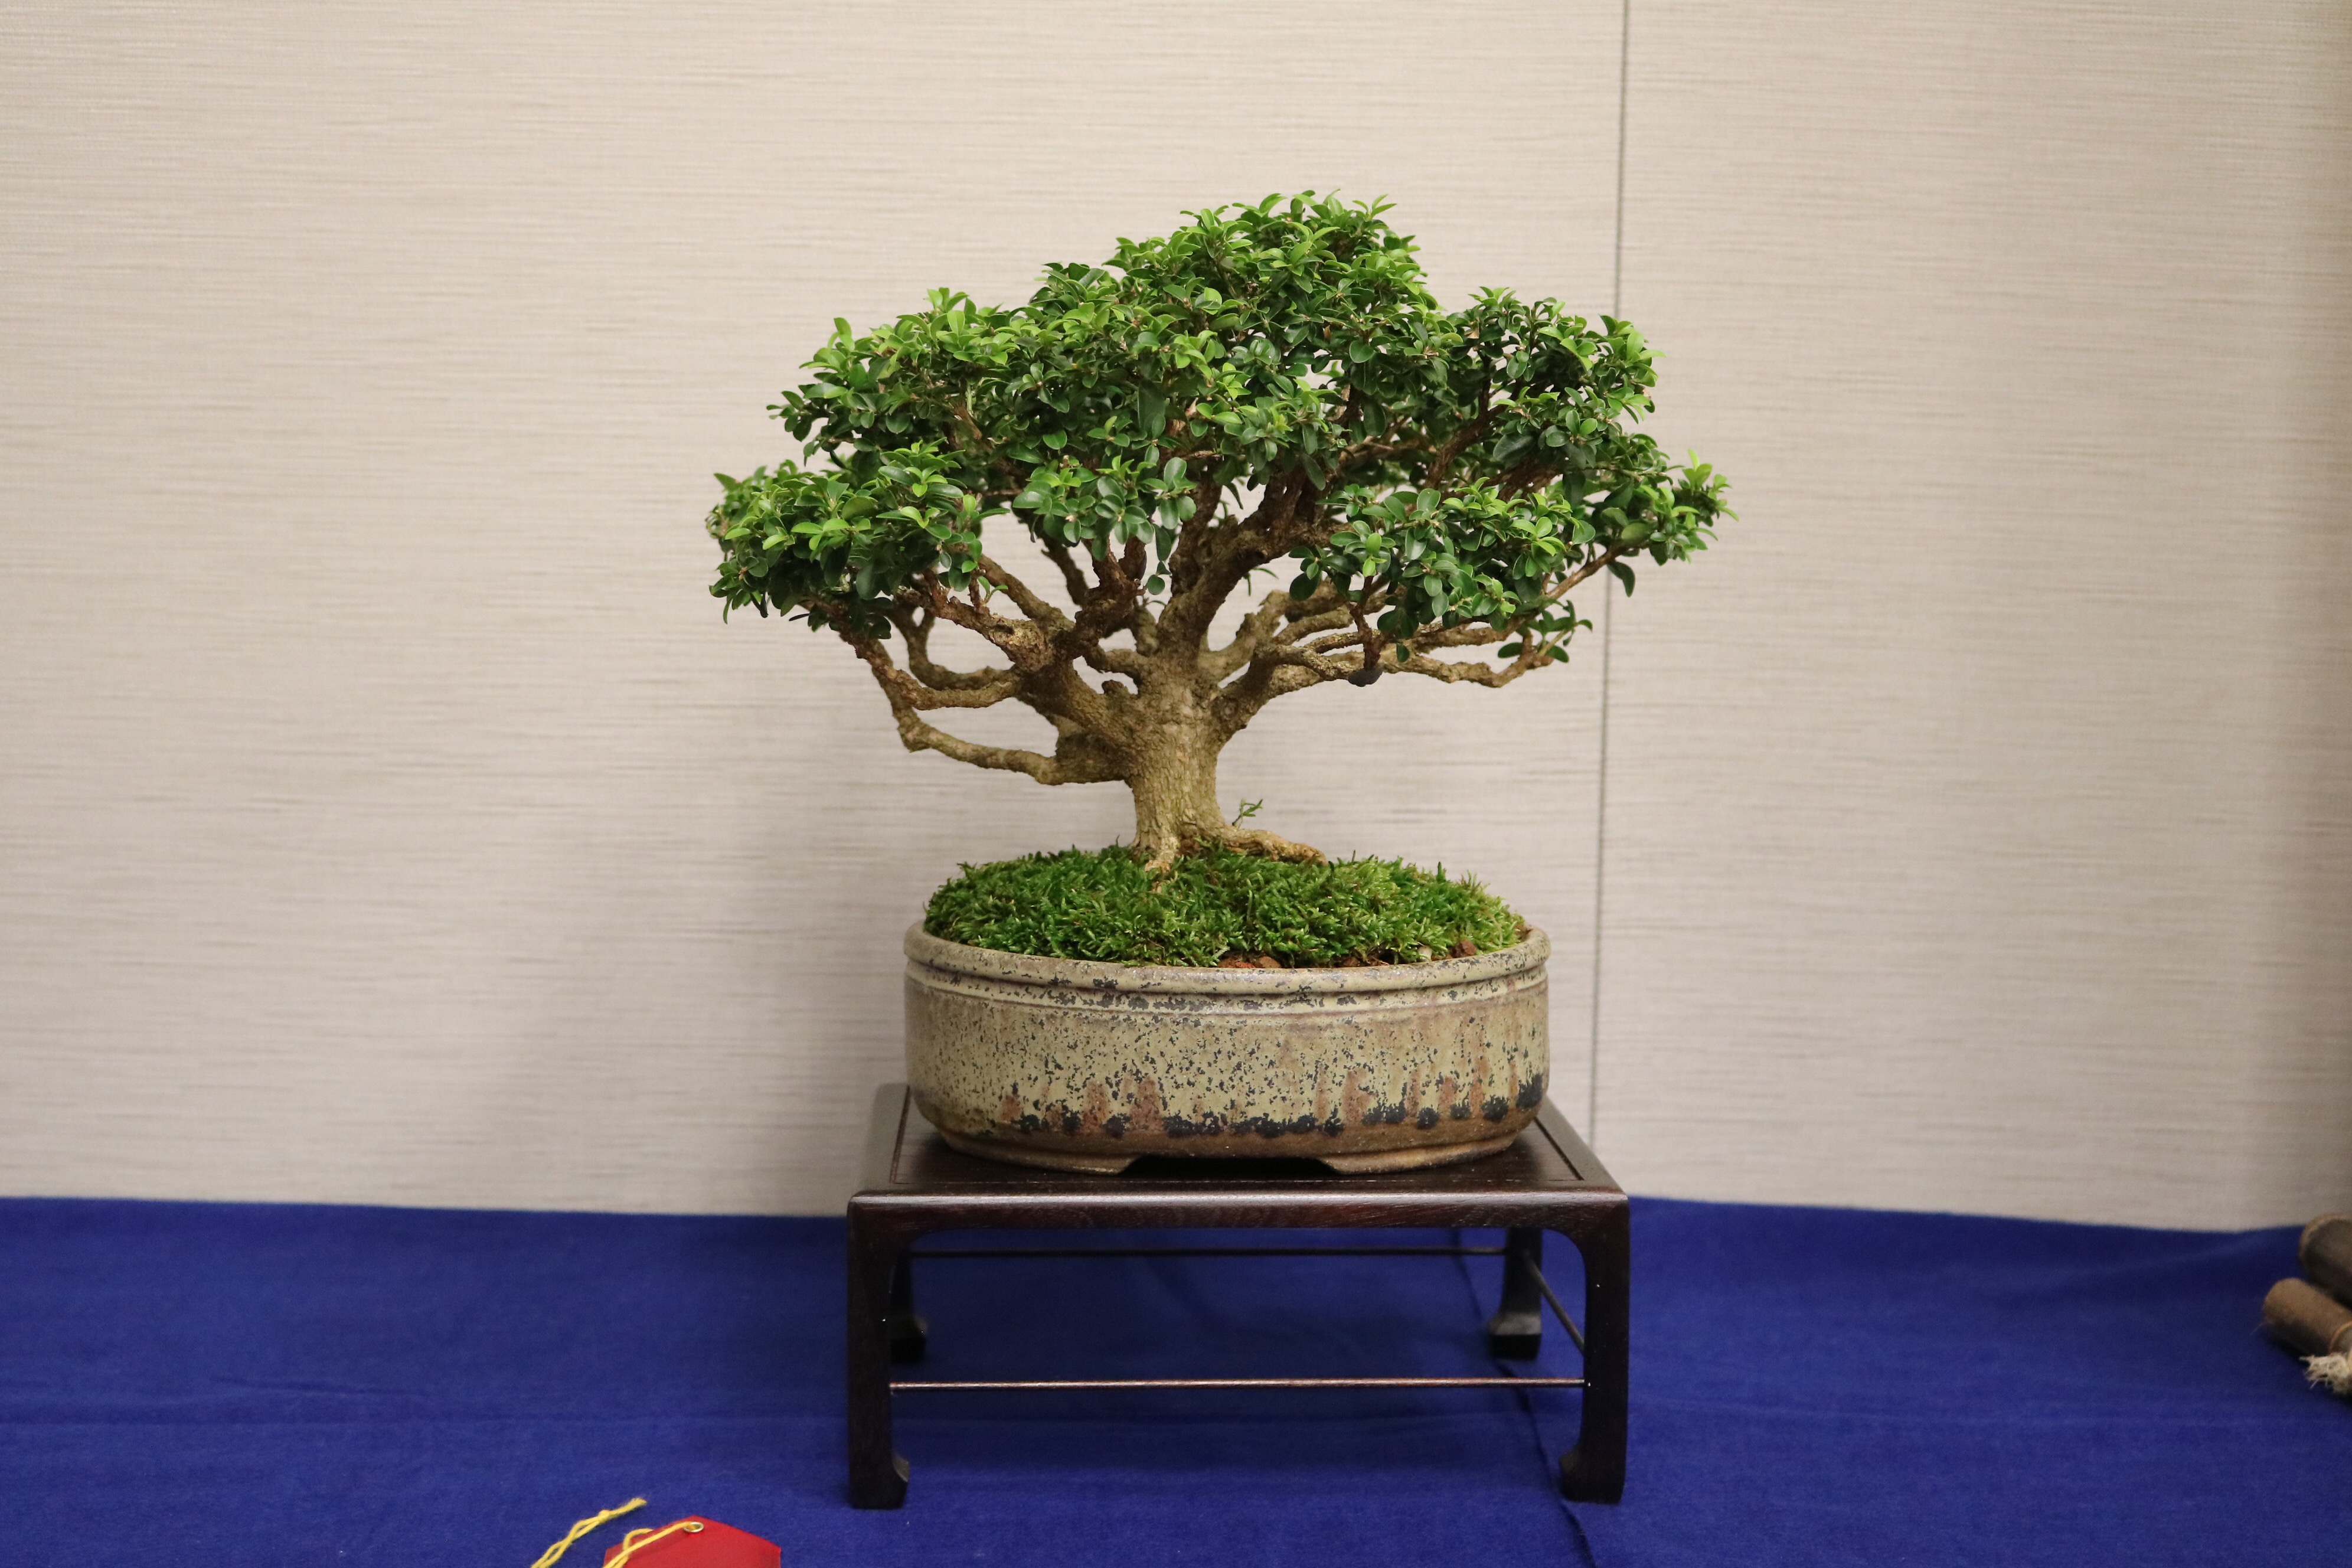 Am bonsai espino albar yamadori - Bonsai verdecora ...